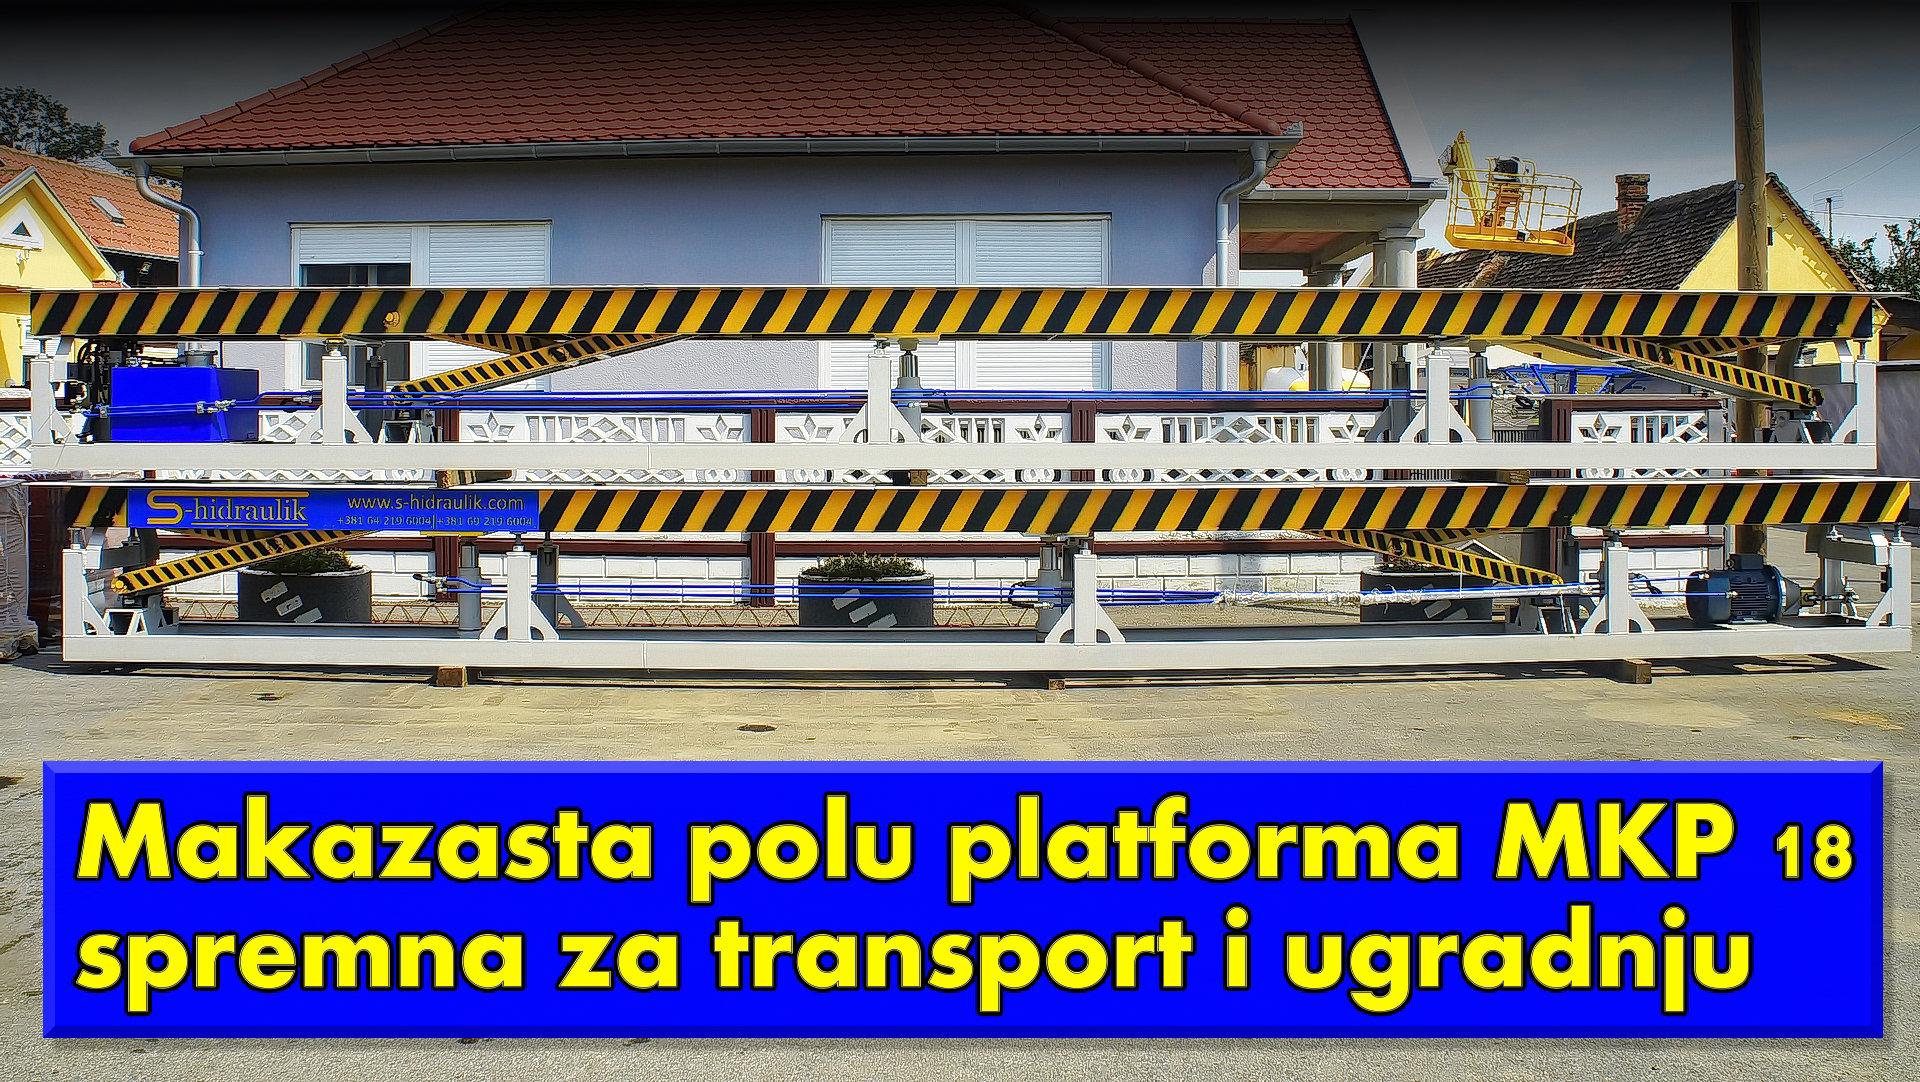 Makazasta polu platforma